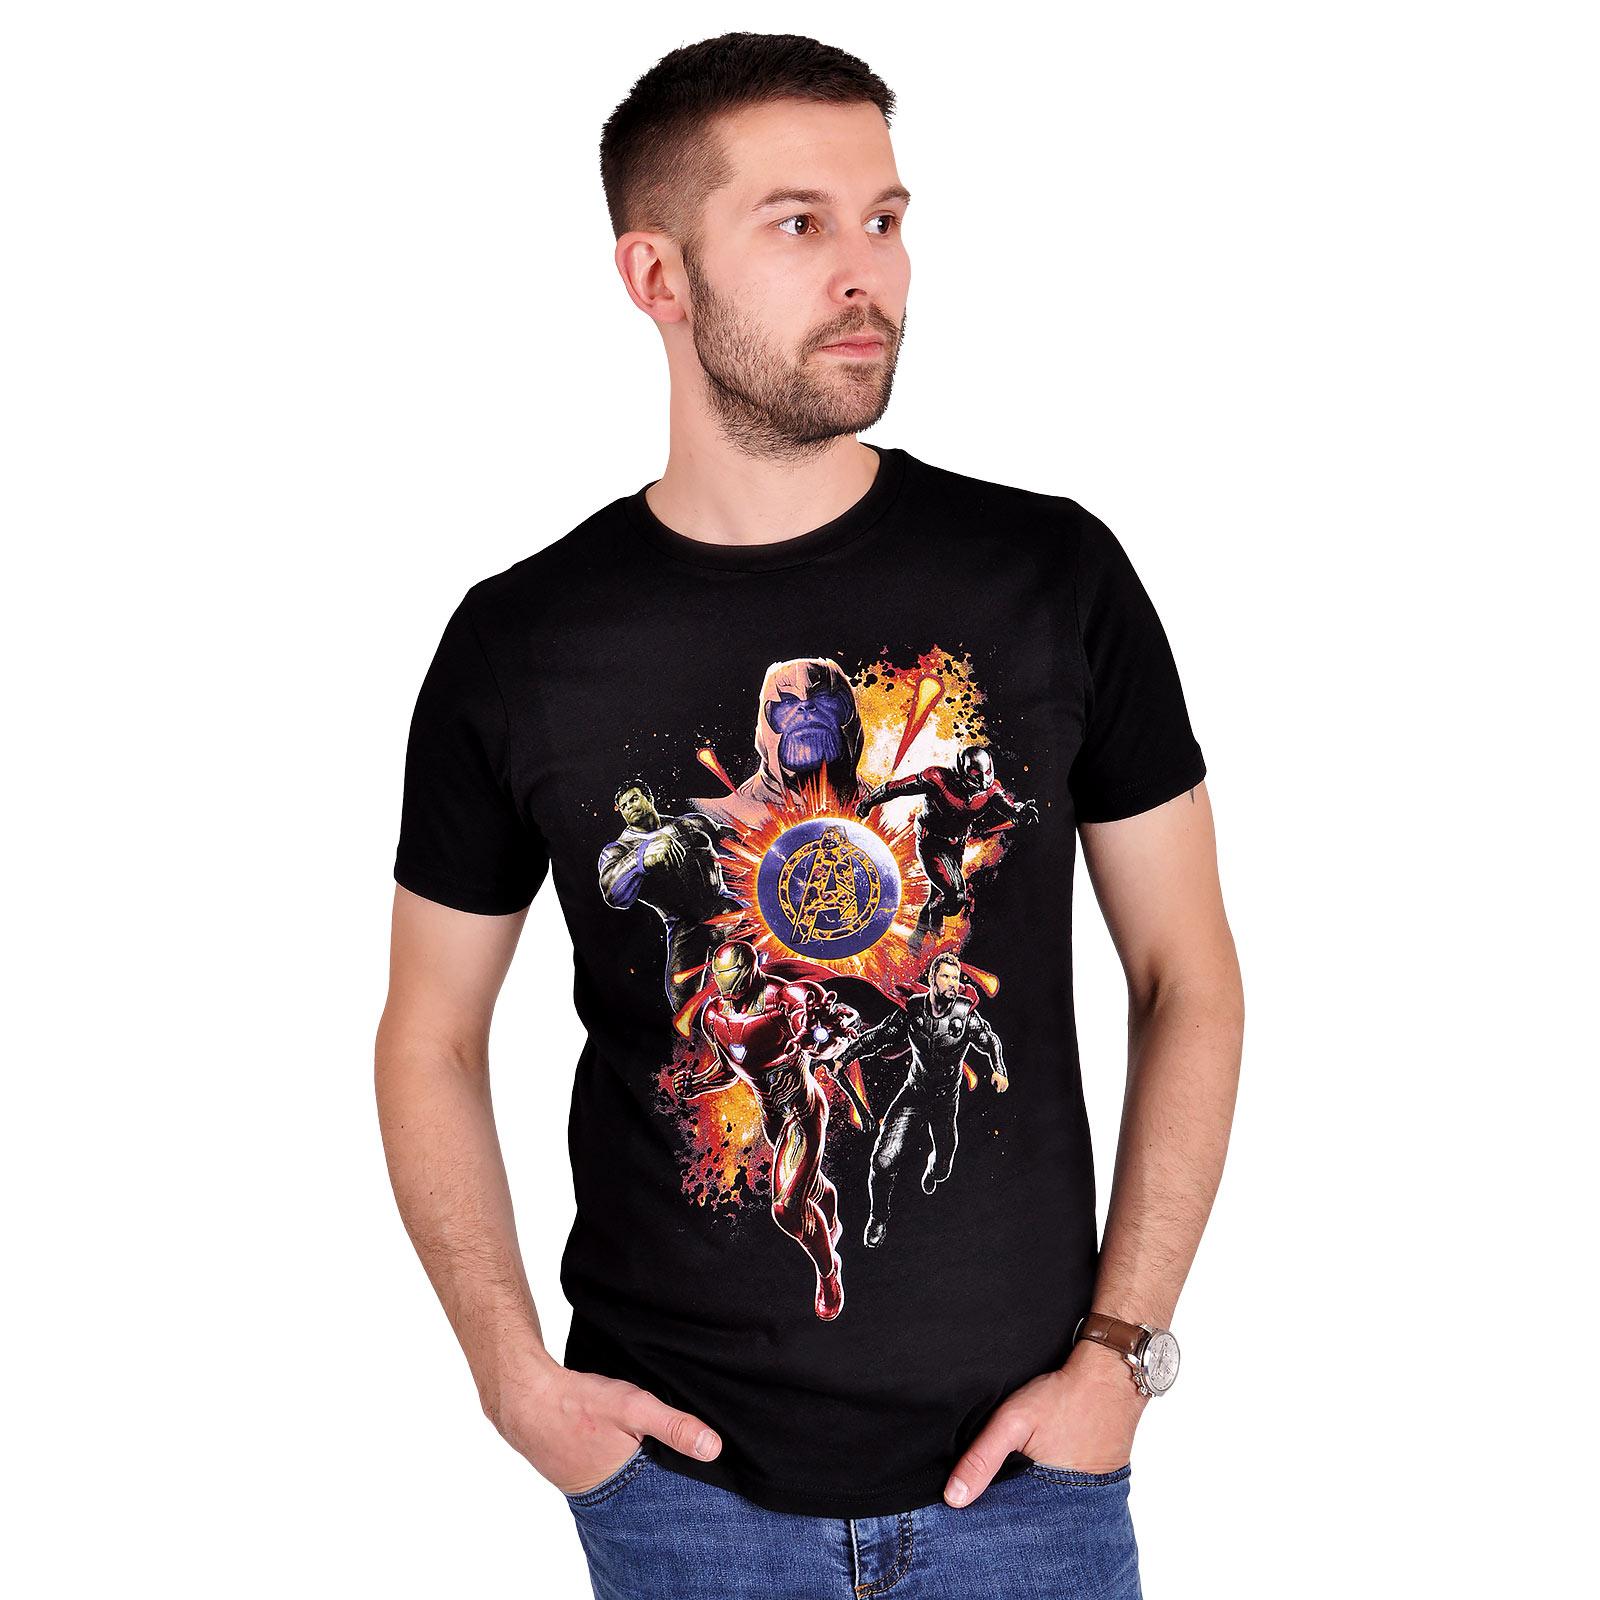 Avengers - Endgame Final Battle T-Shirt schwarz